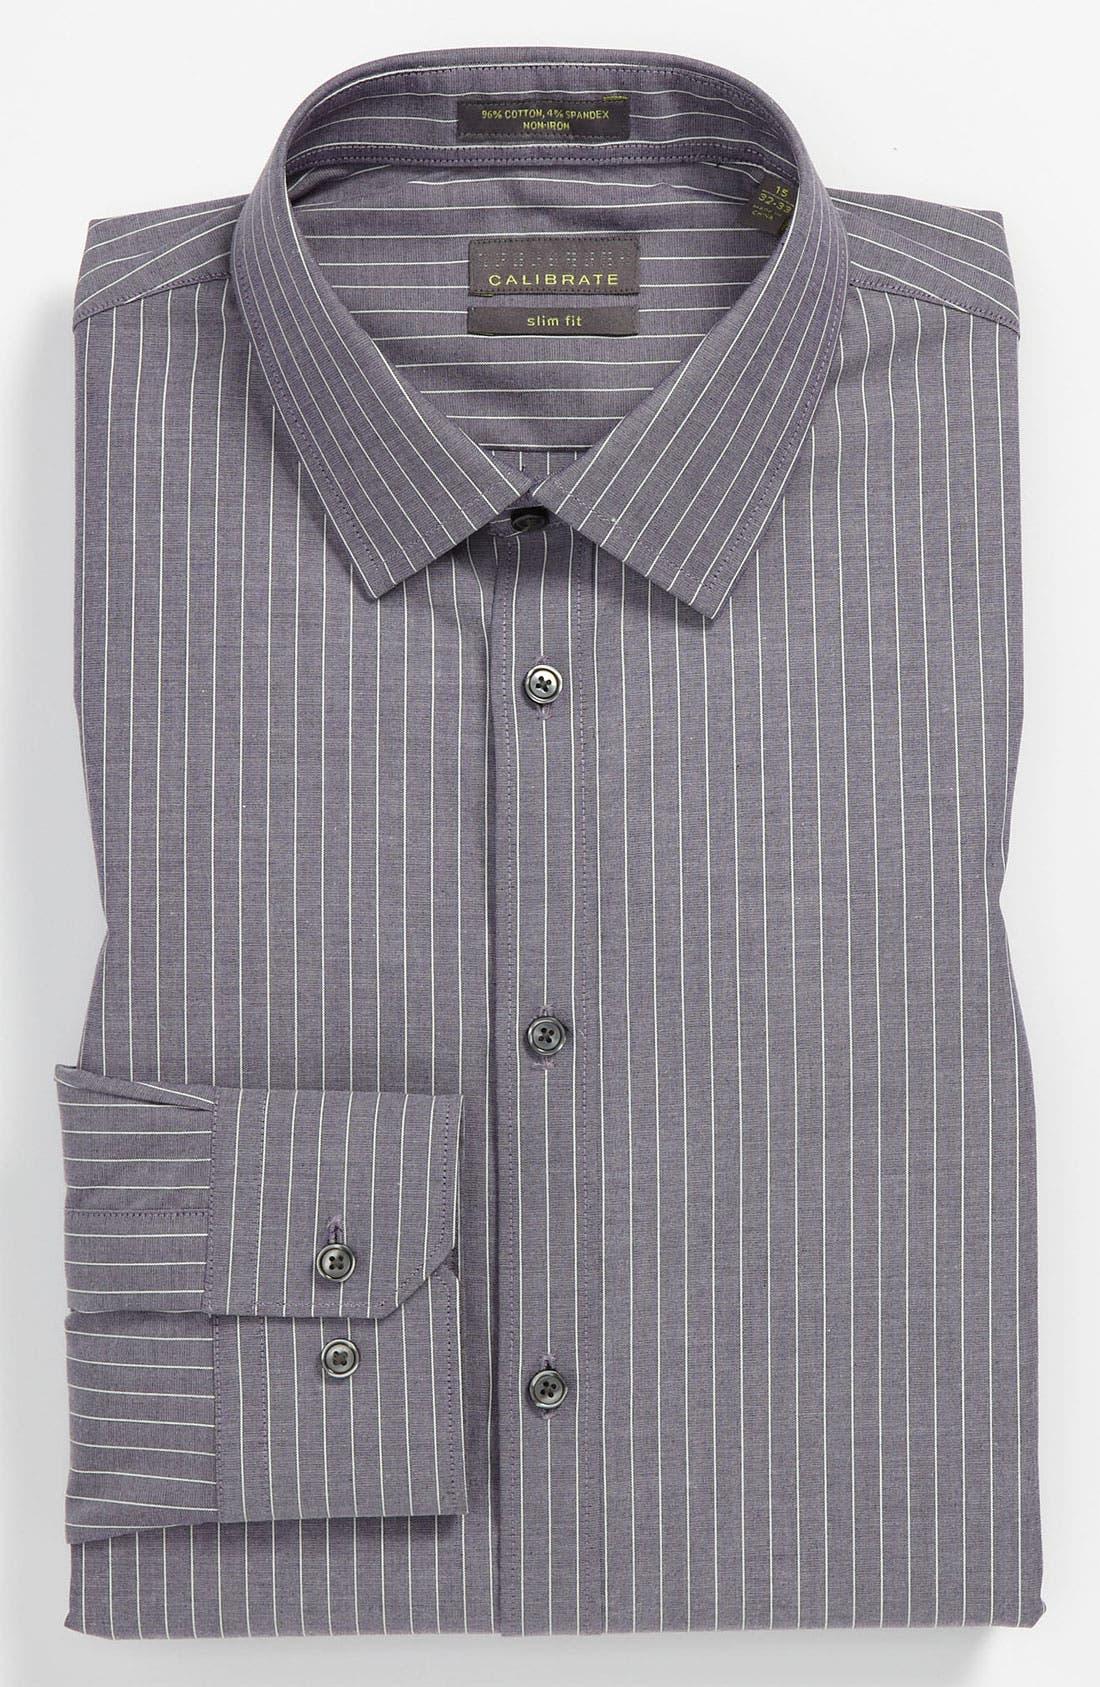 Main Image - Calibrate Slim Fit Non-Iron Dress Shirt